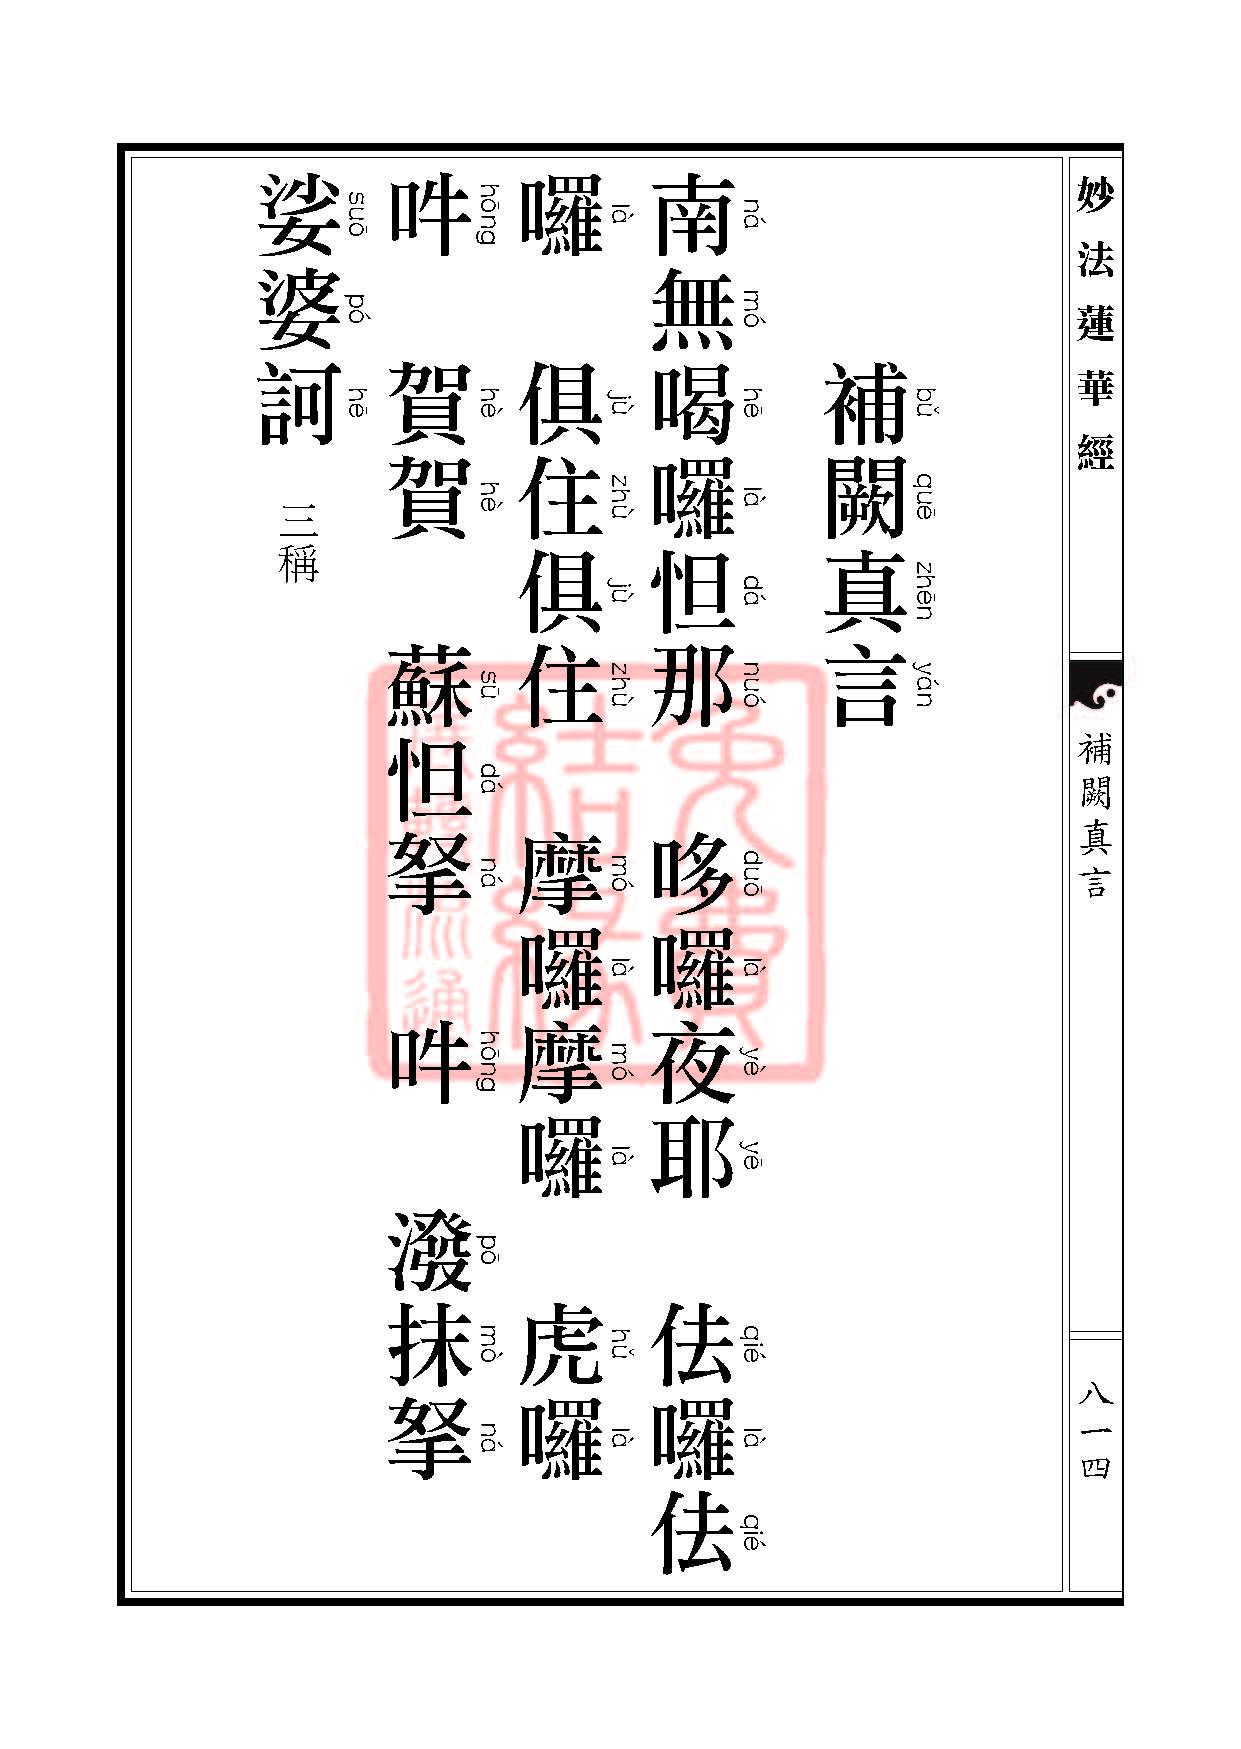 Book_FHJ_HK-A6-PY_Web_页面_814.jpg